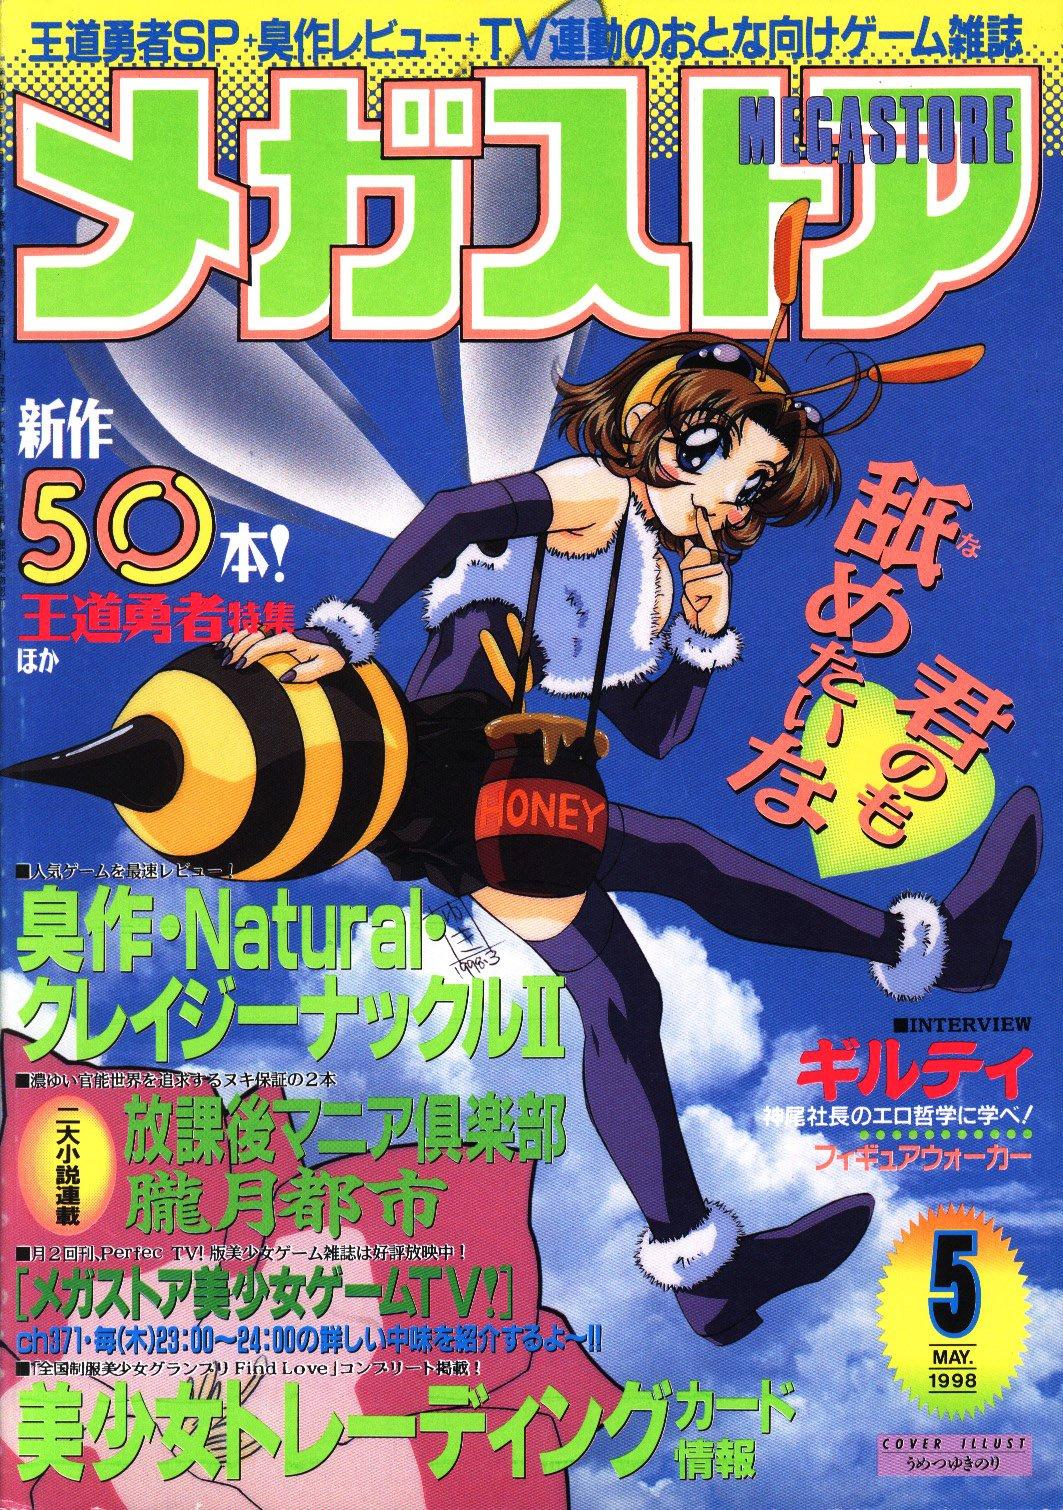 MegaStore 061 (May 1998)